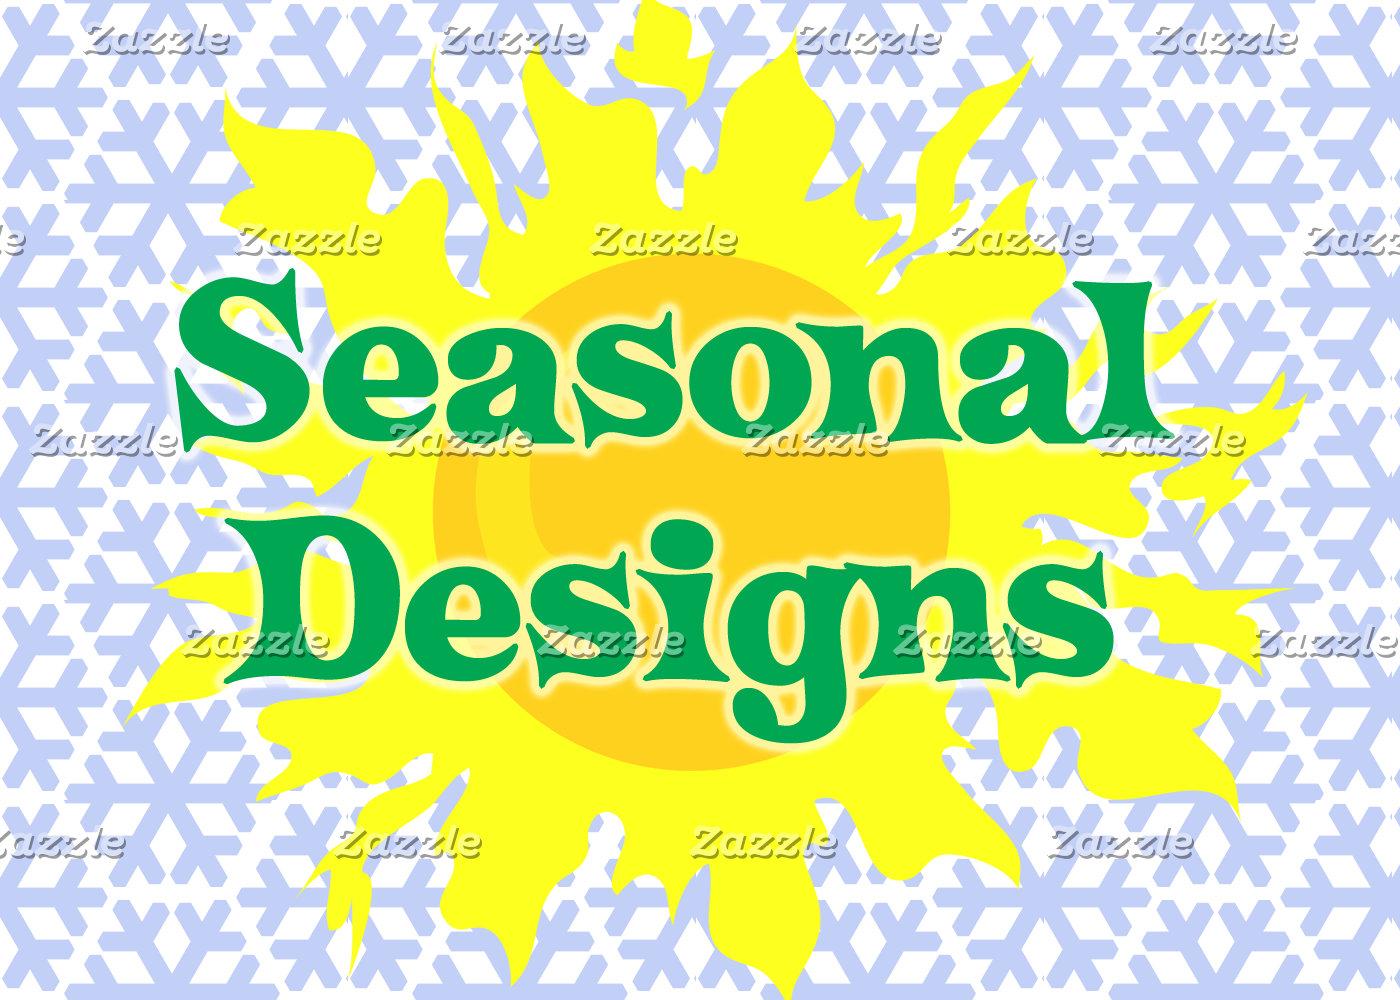 Seasonal Sayings!